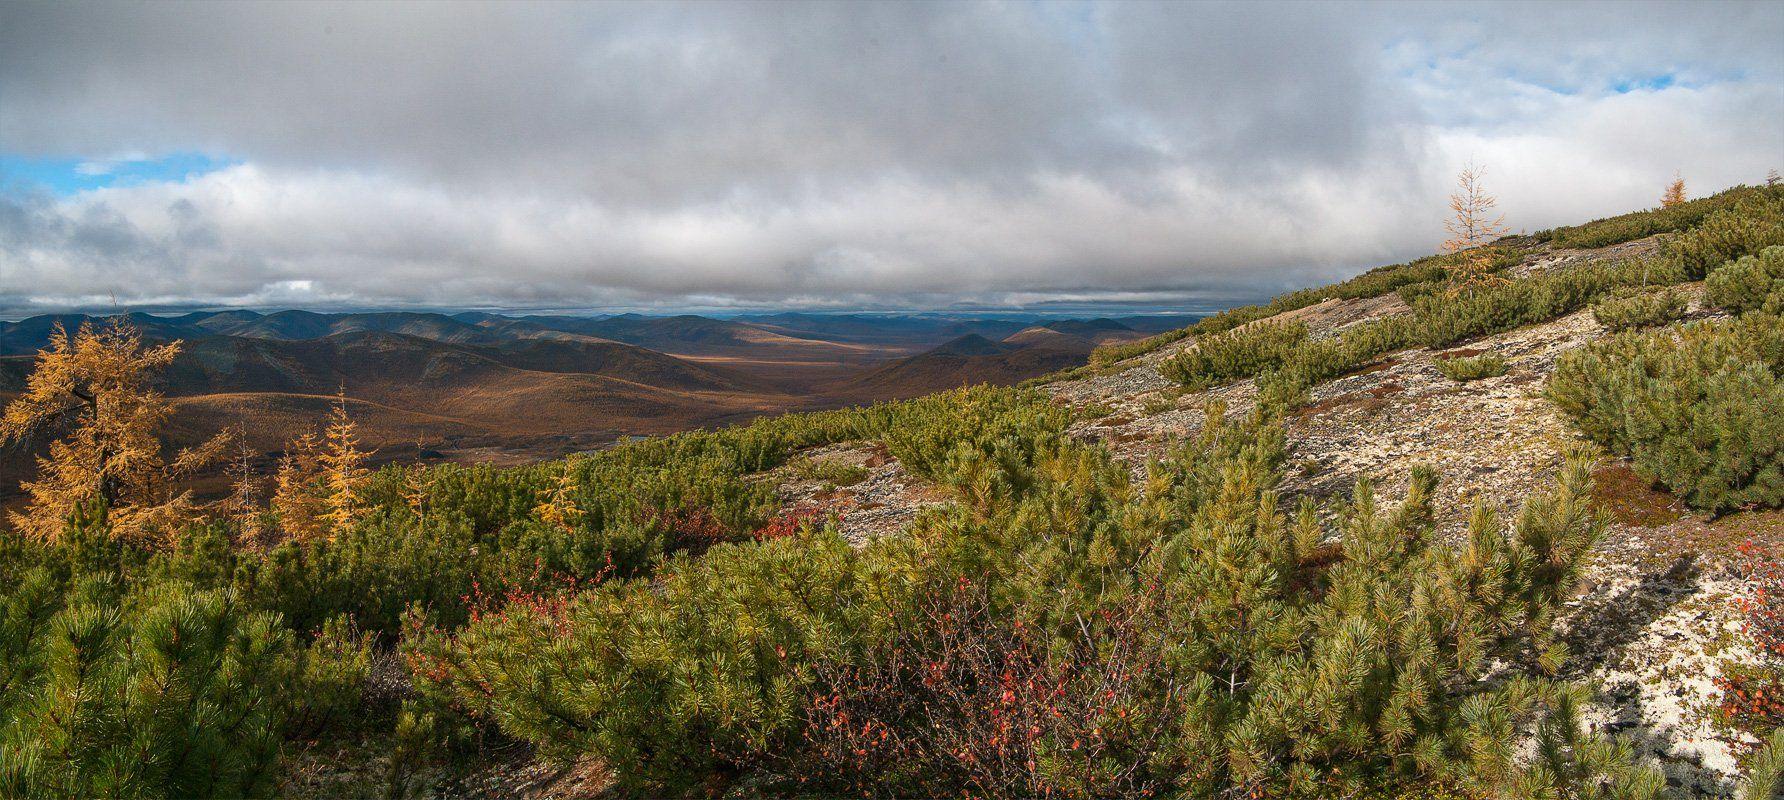 якутия, осень, лиственница, трасса, колыма, Александр Гиль